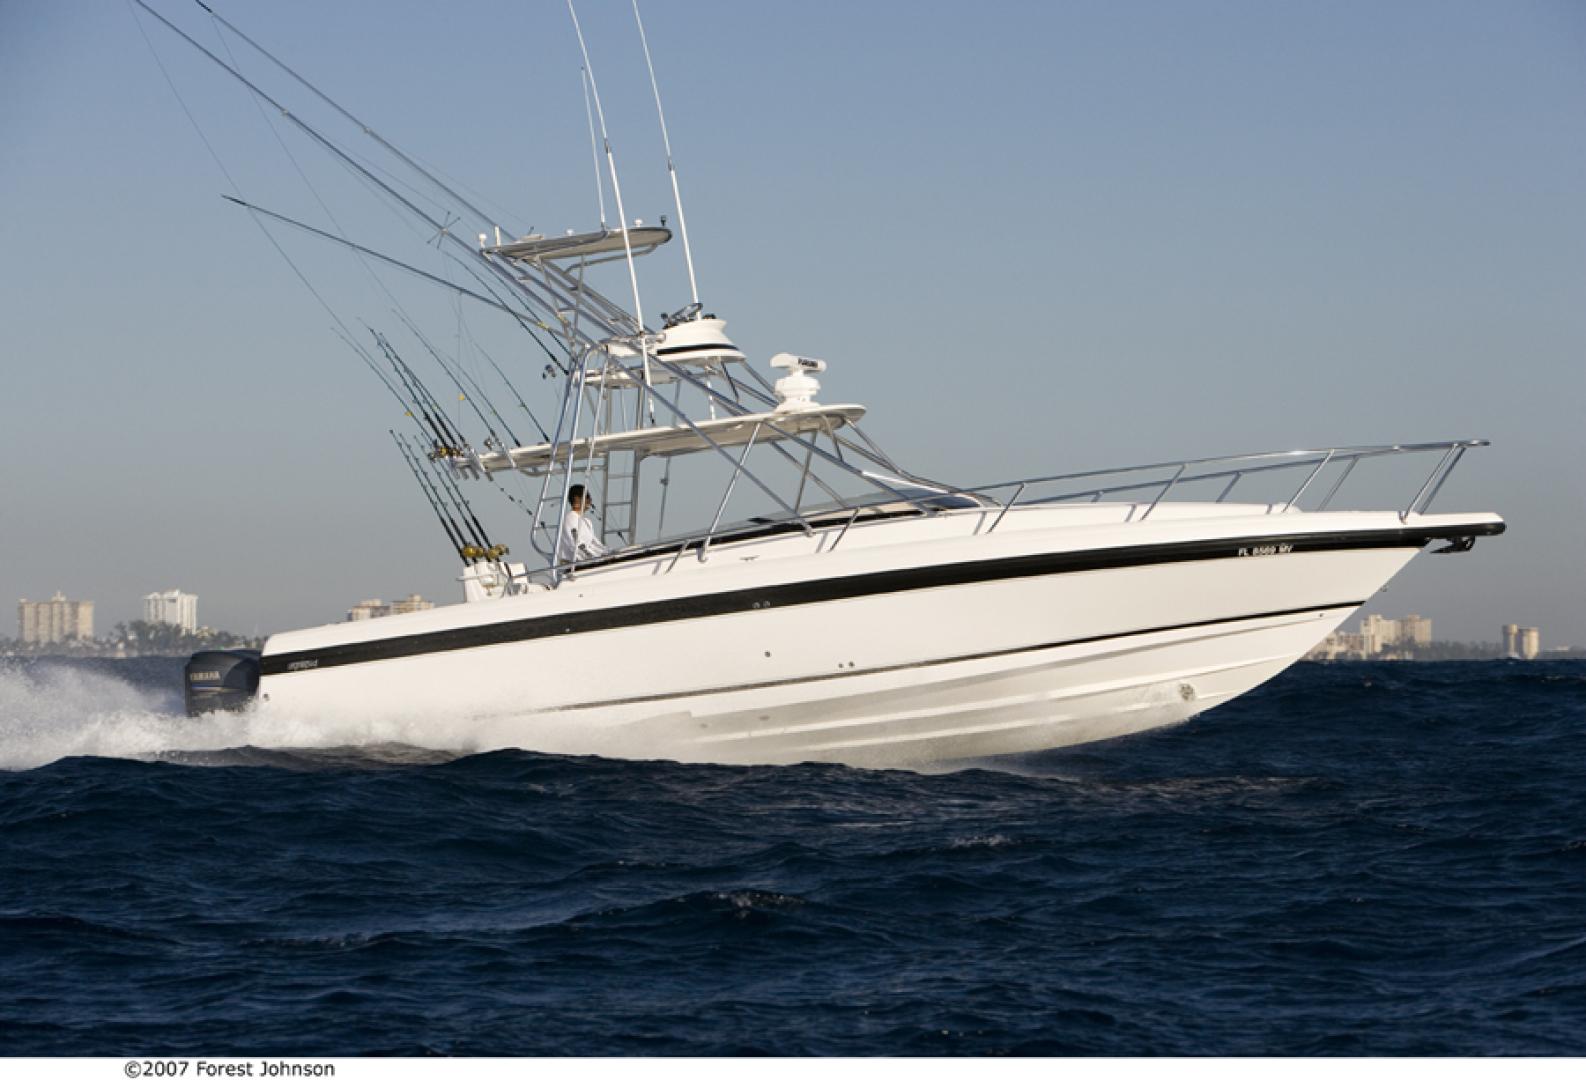 Intrepid-377 Walkaround 2005-Rock Boat REFIT 2018 Dania Beach-Florida-United States-377 Intrepid Profile-1539582 | Thumbnail